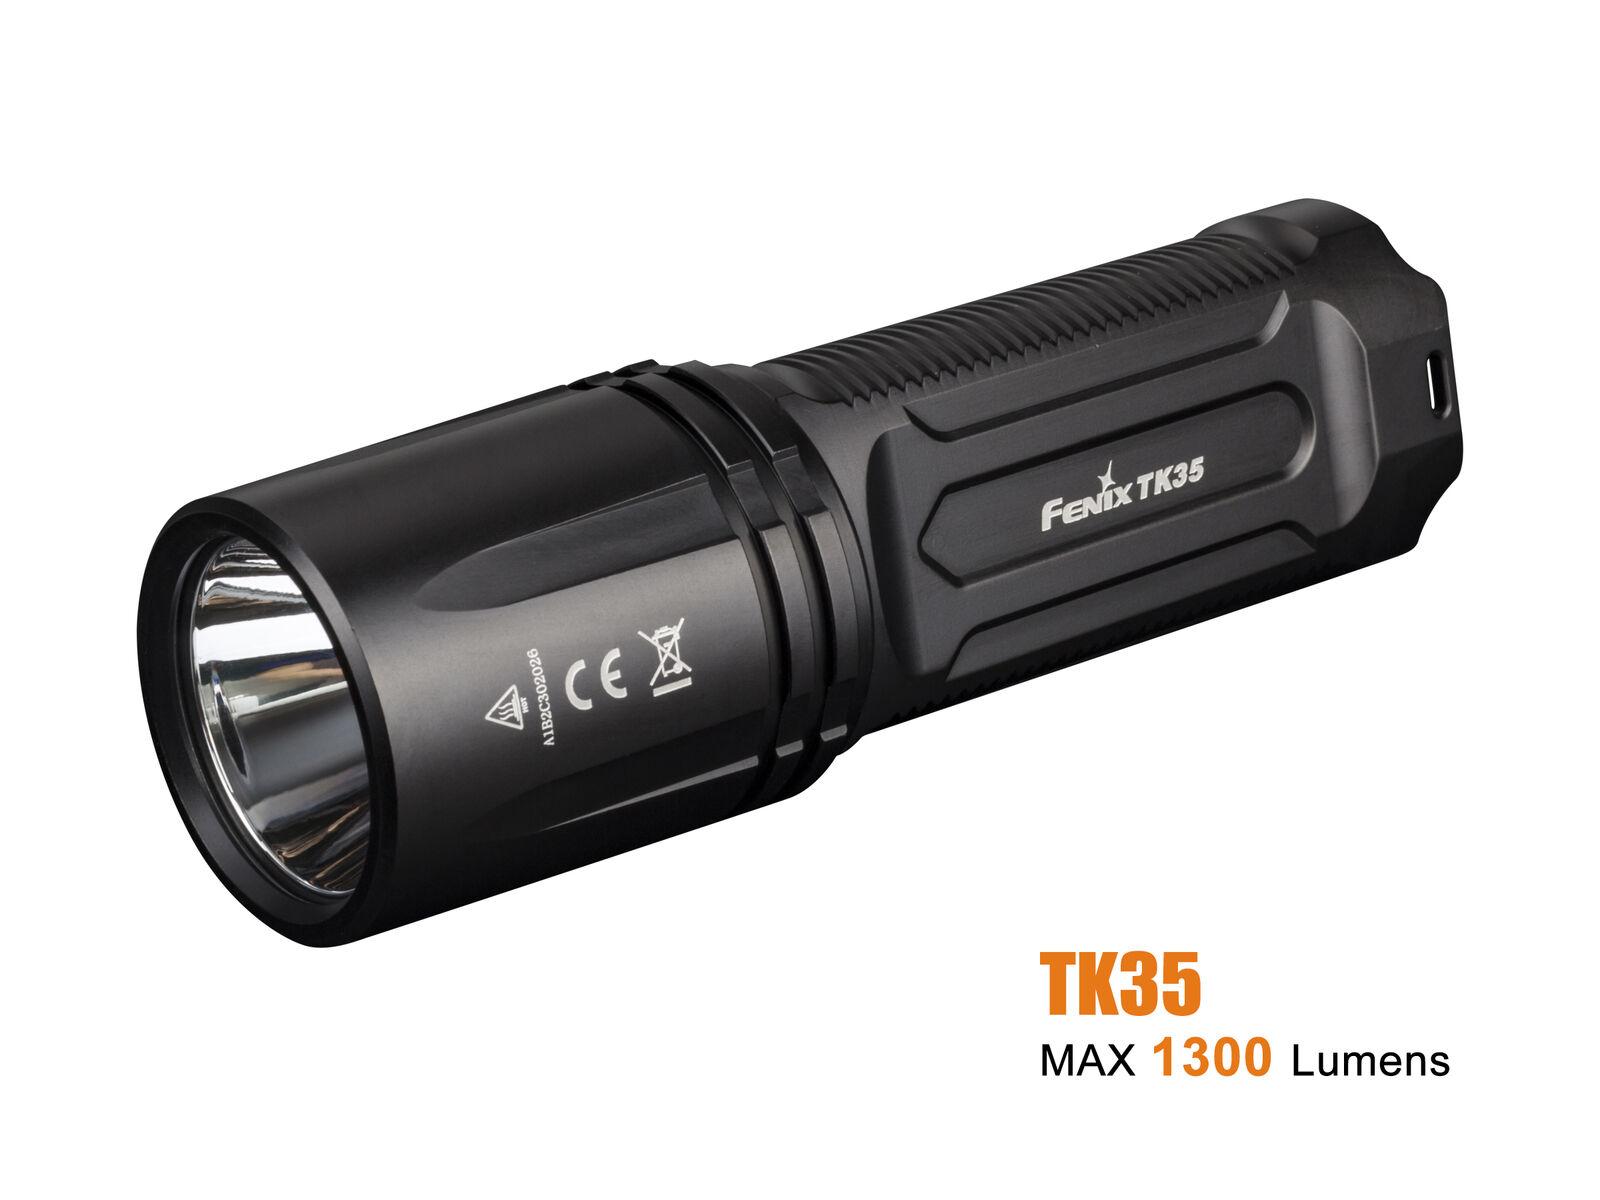 Fenix TK35 2018 CREE XHP35 HI Neutral bianca LED 1300 Luuomini FlashlightBattery